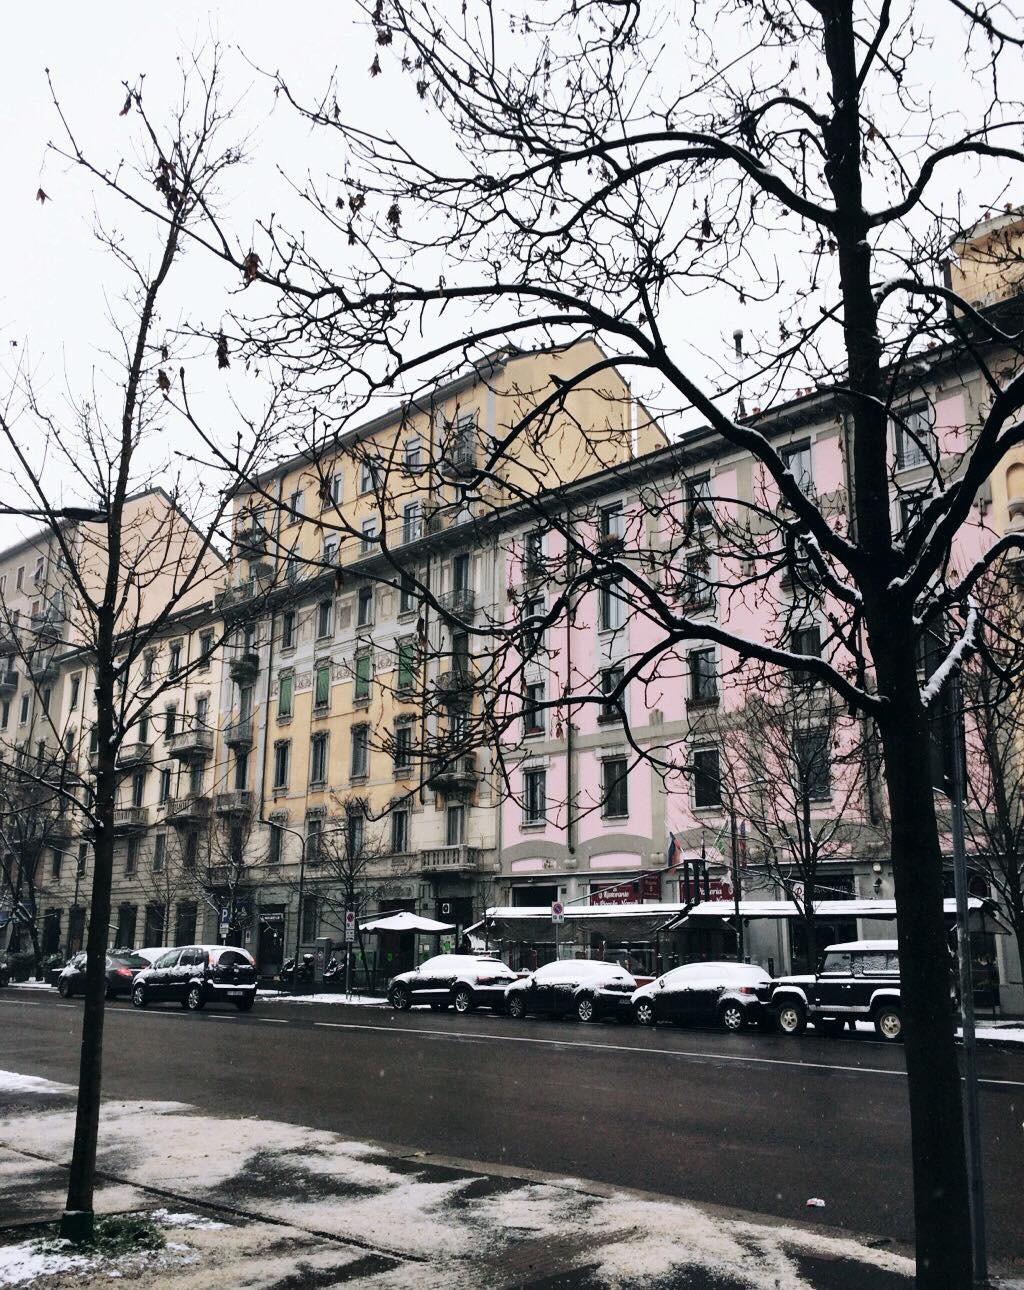 Milan sous la neige